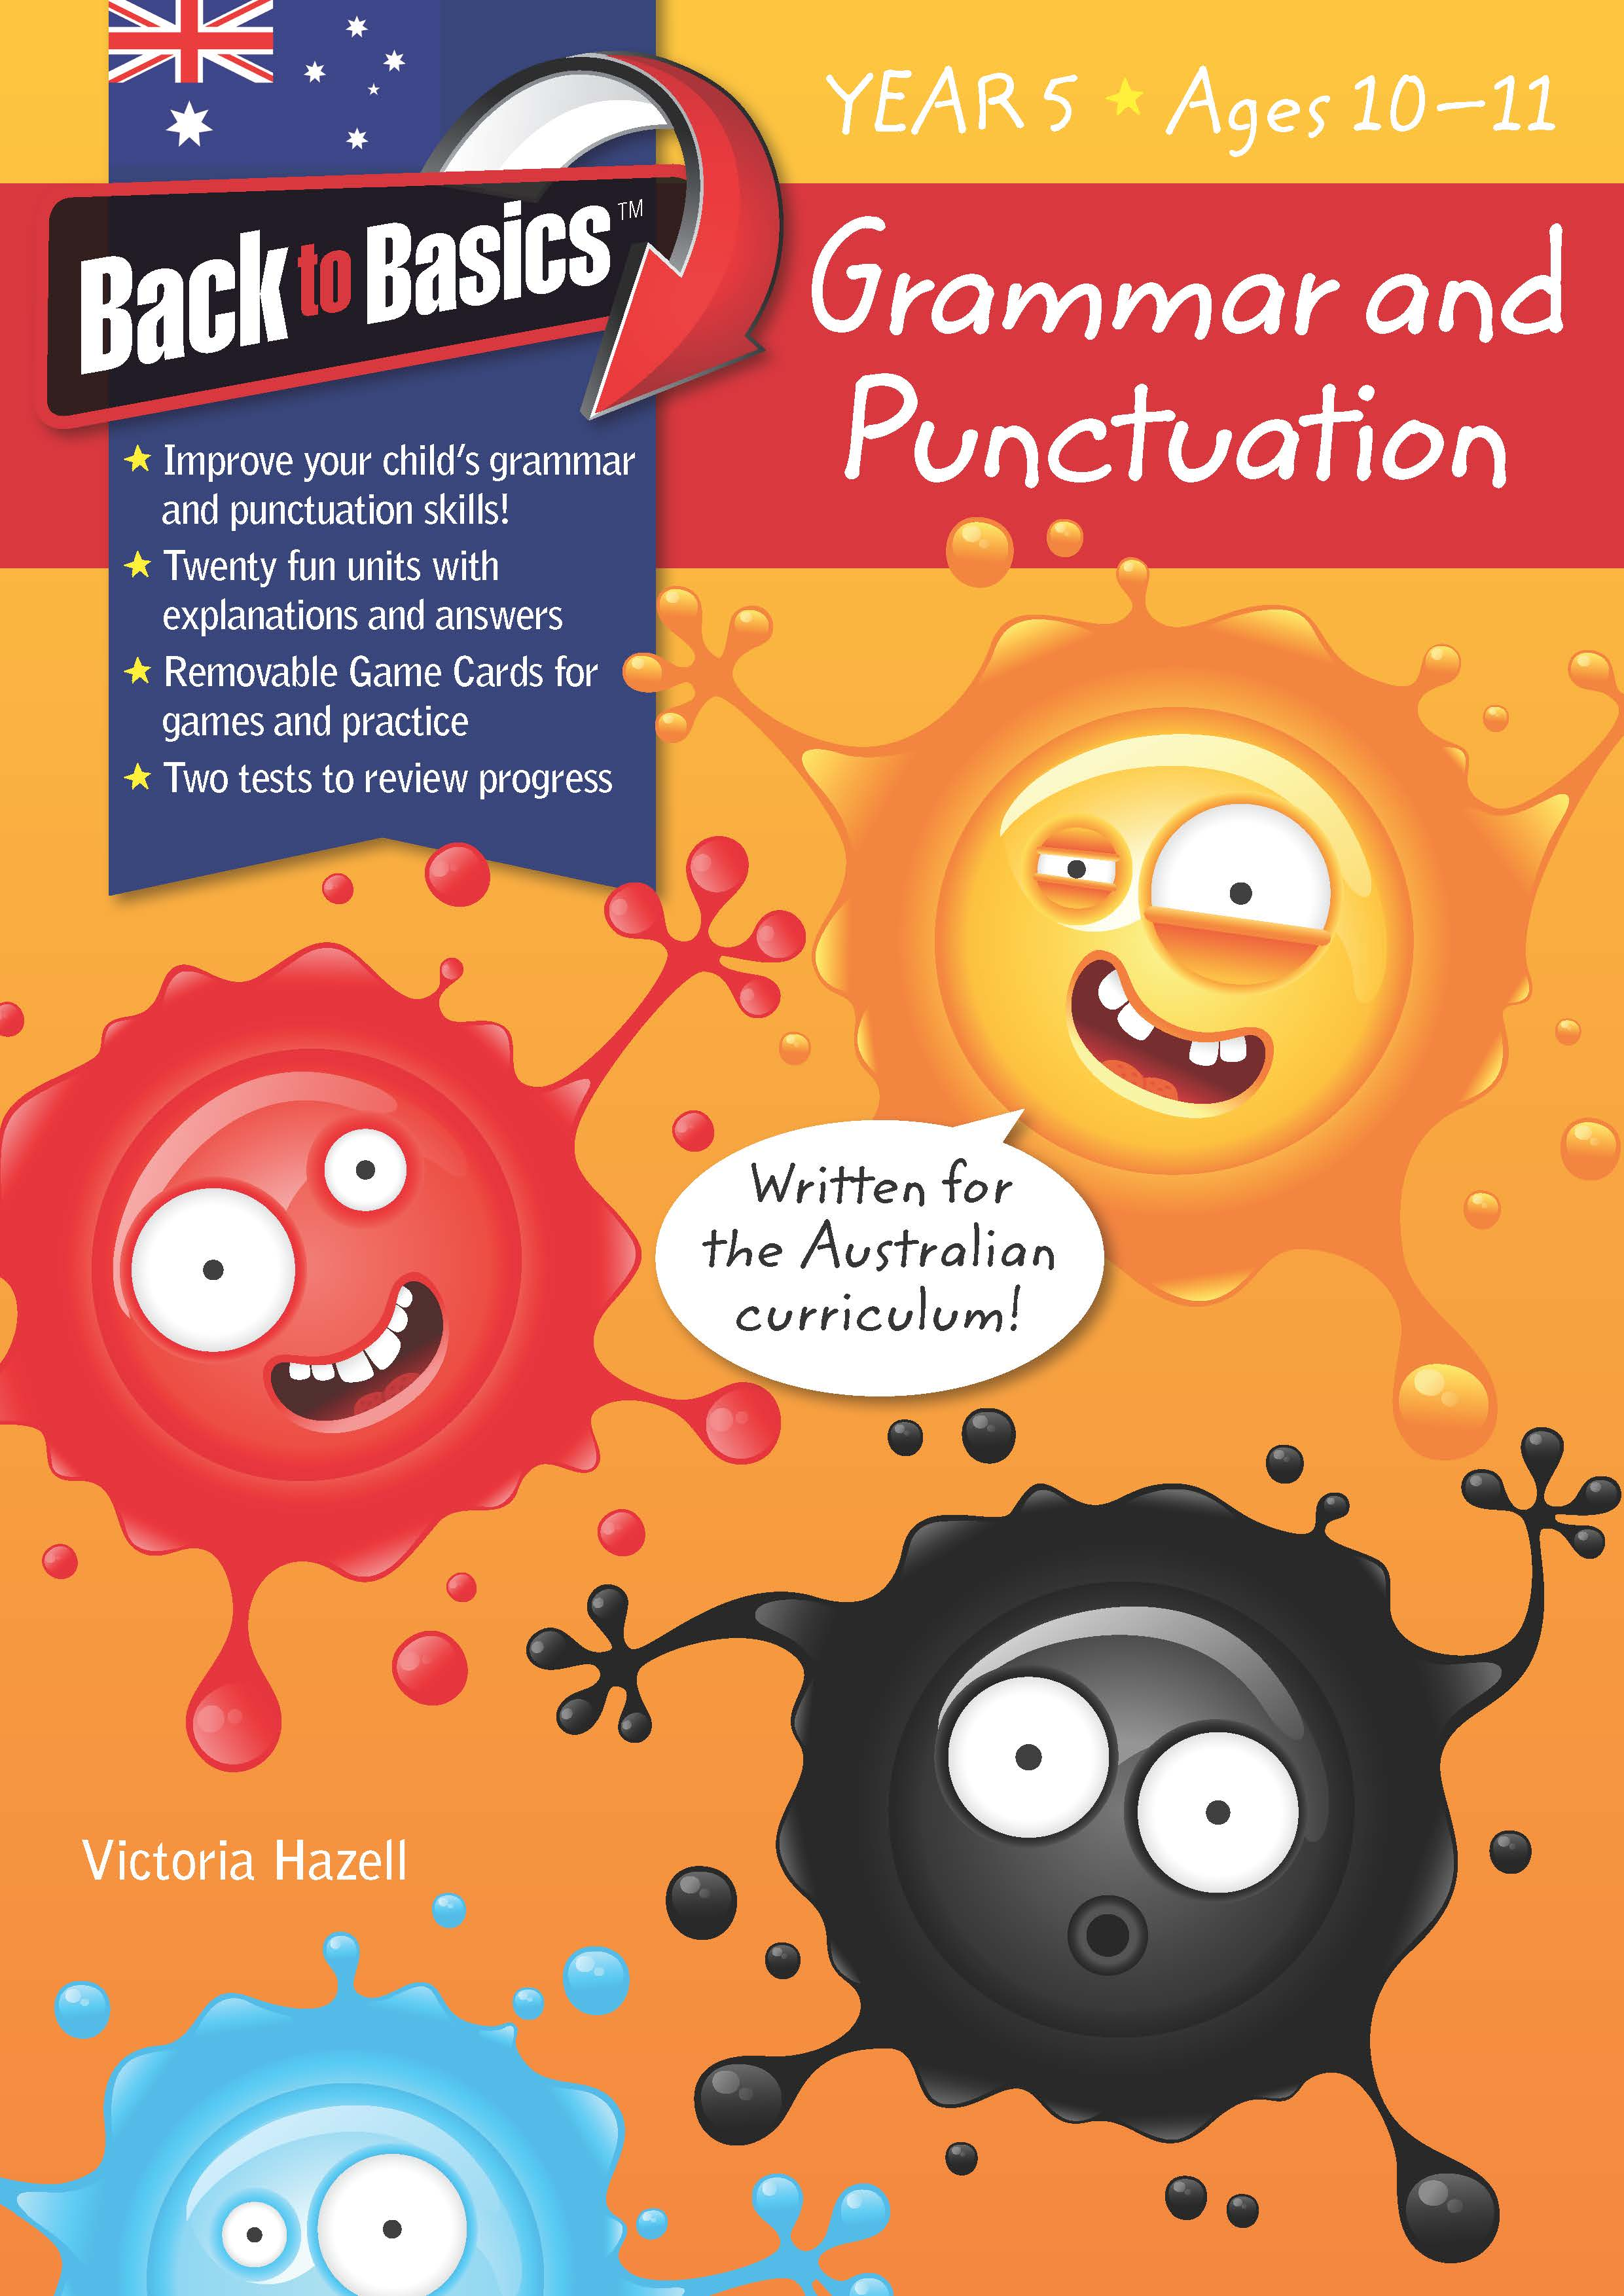 Back to Basics - Grammar & Punctuation Year 5